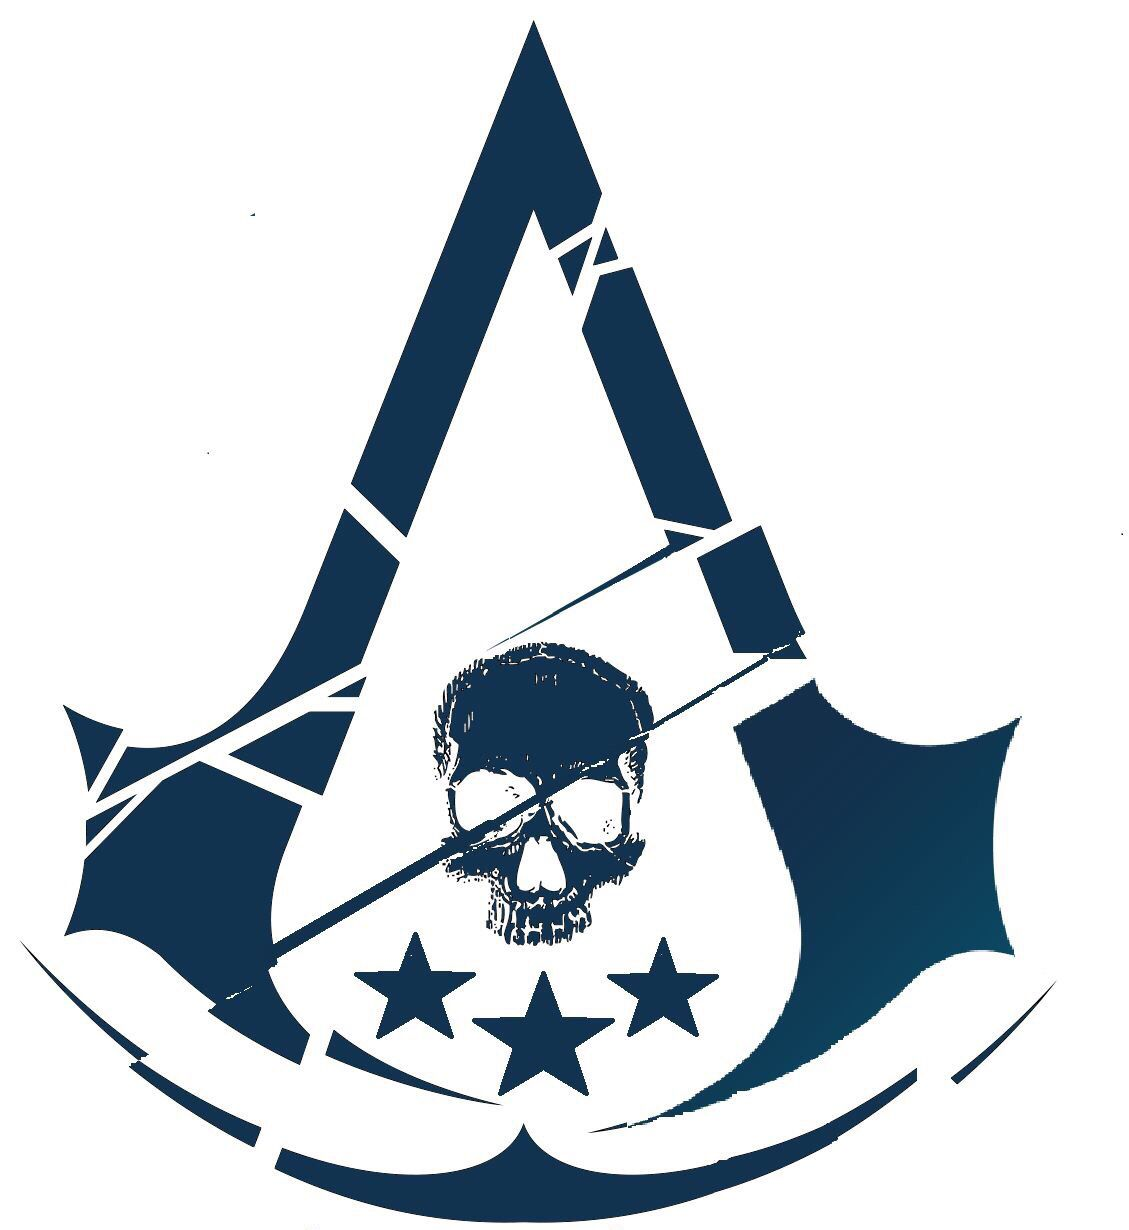 Assassins Creed Merged Logos Assassins Creed Artwork Assassins Creed Art Assassins Creed Tattoo